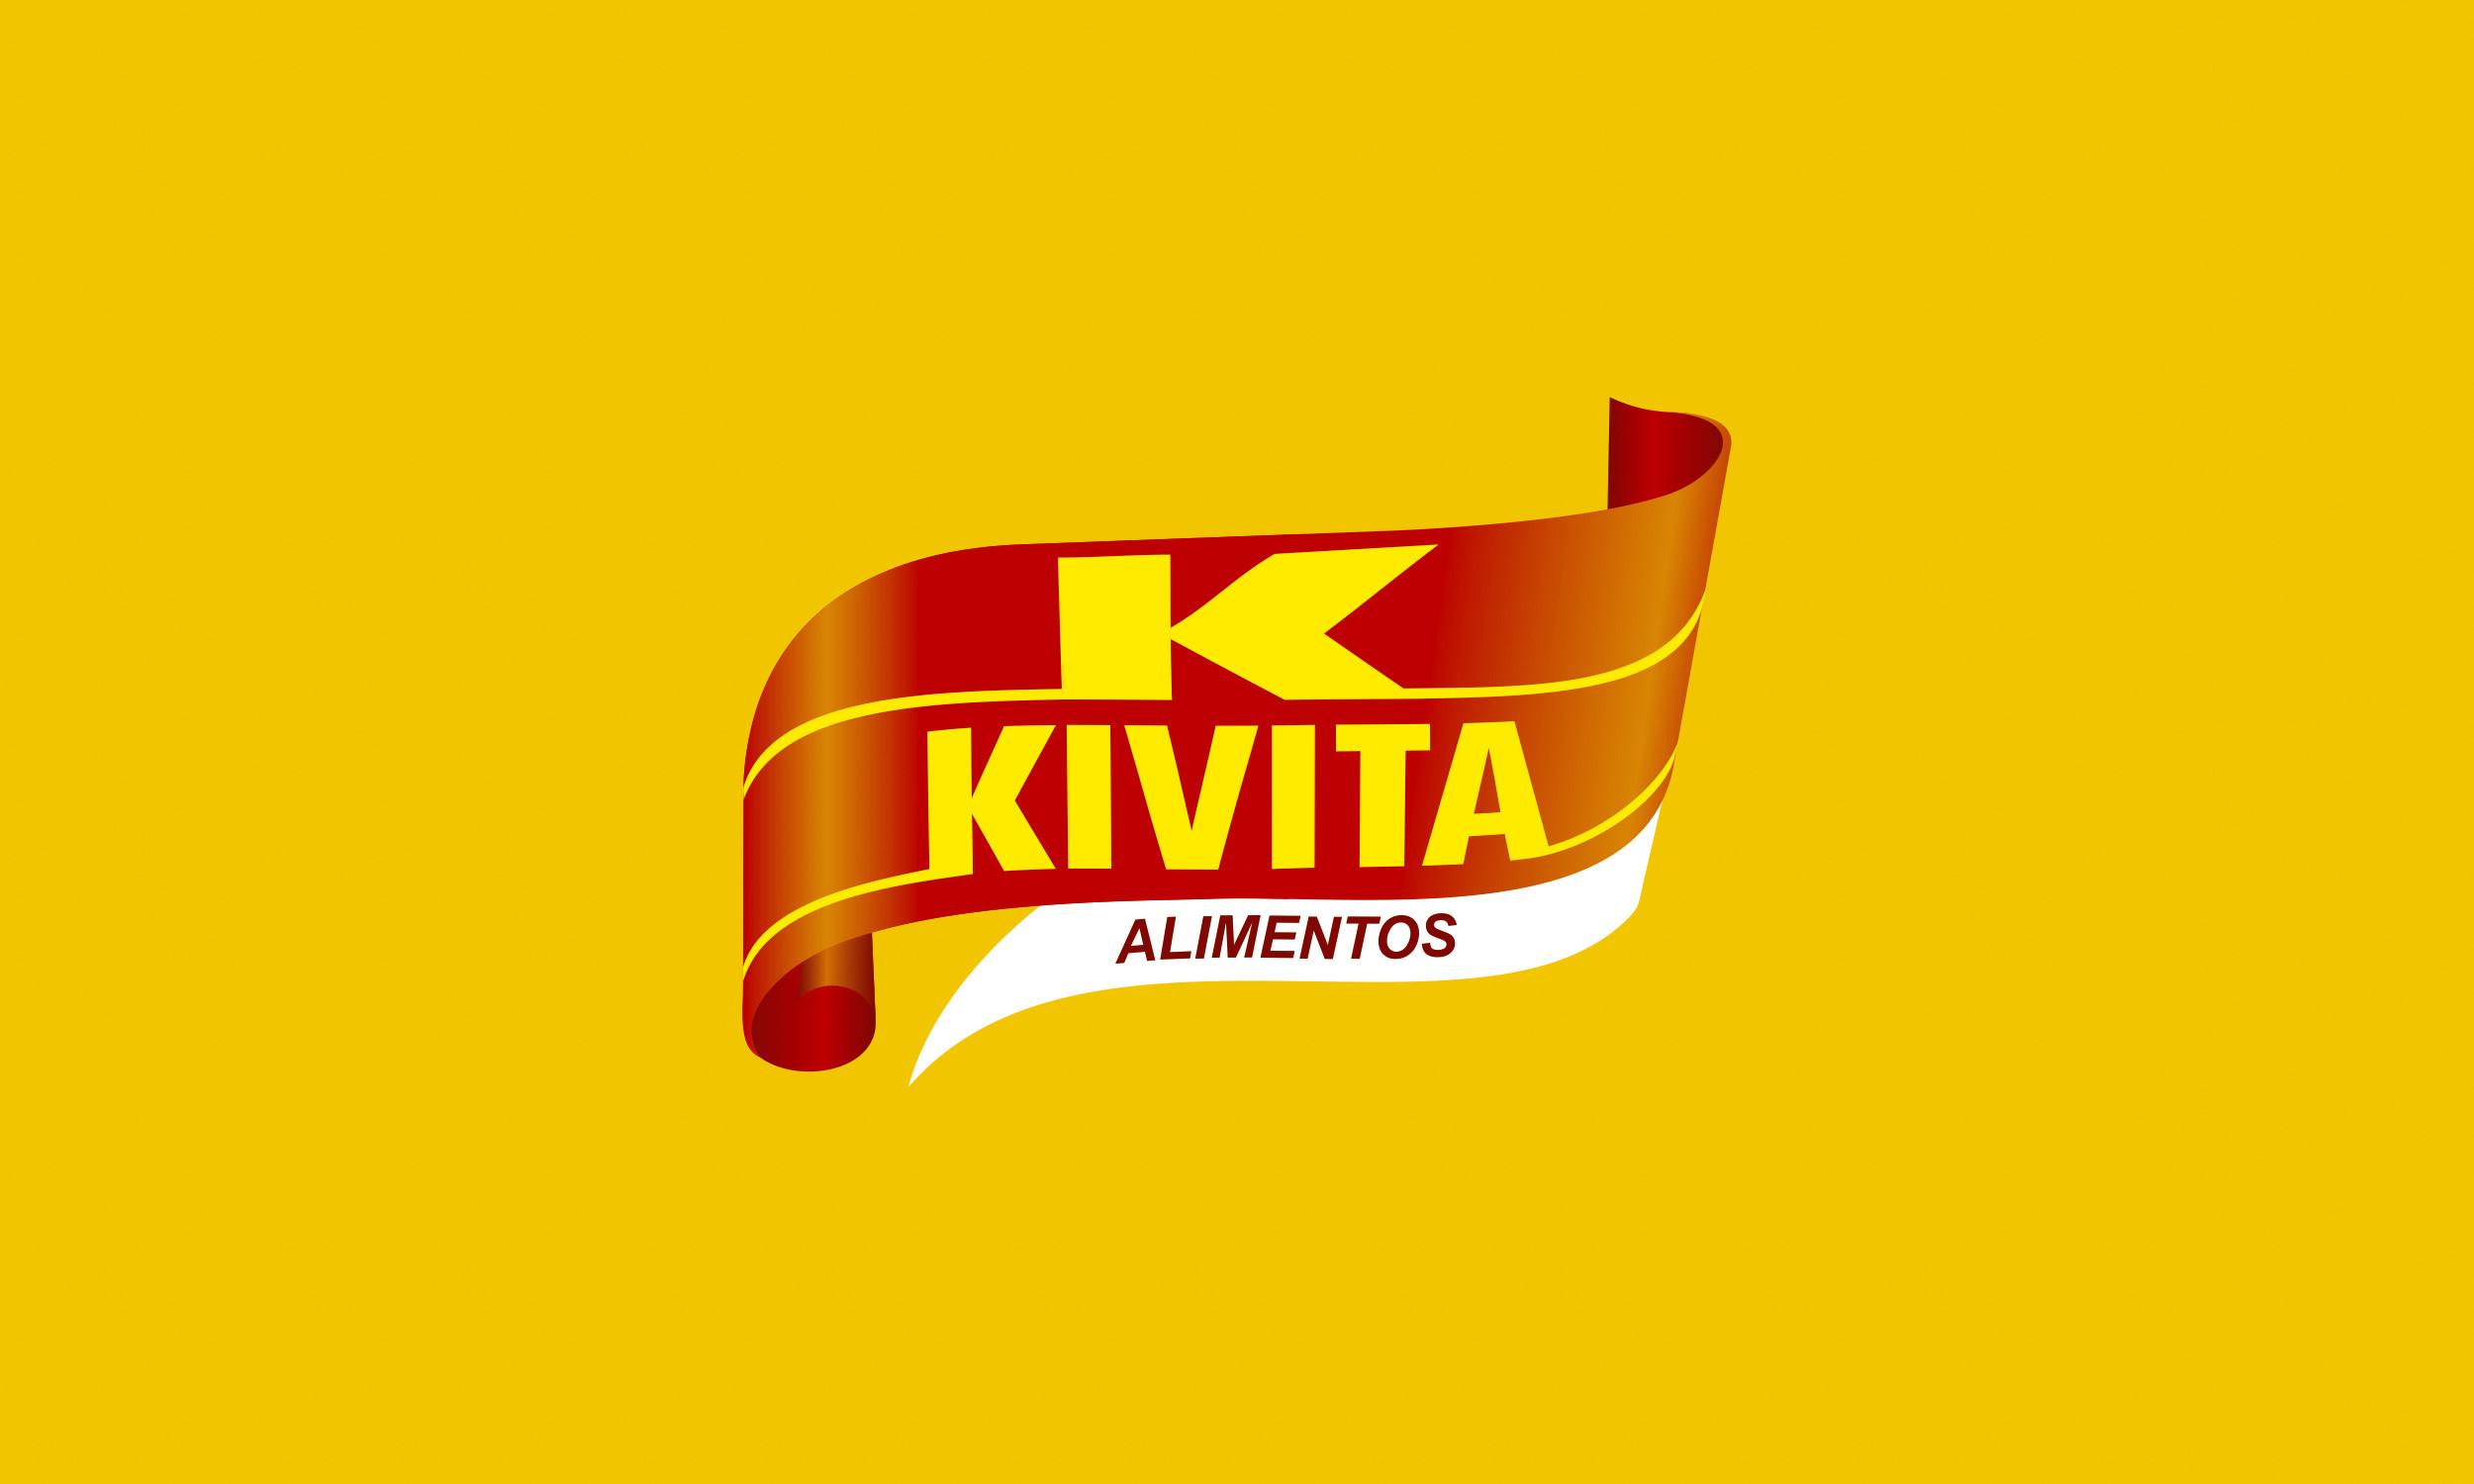 Kivita